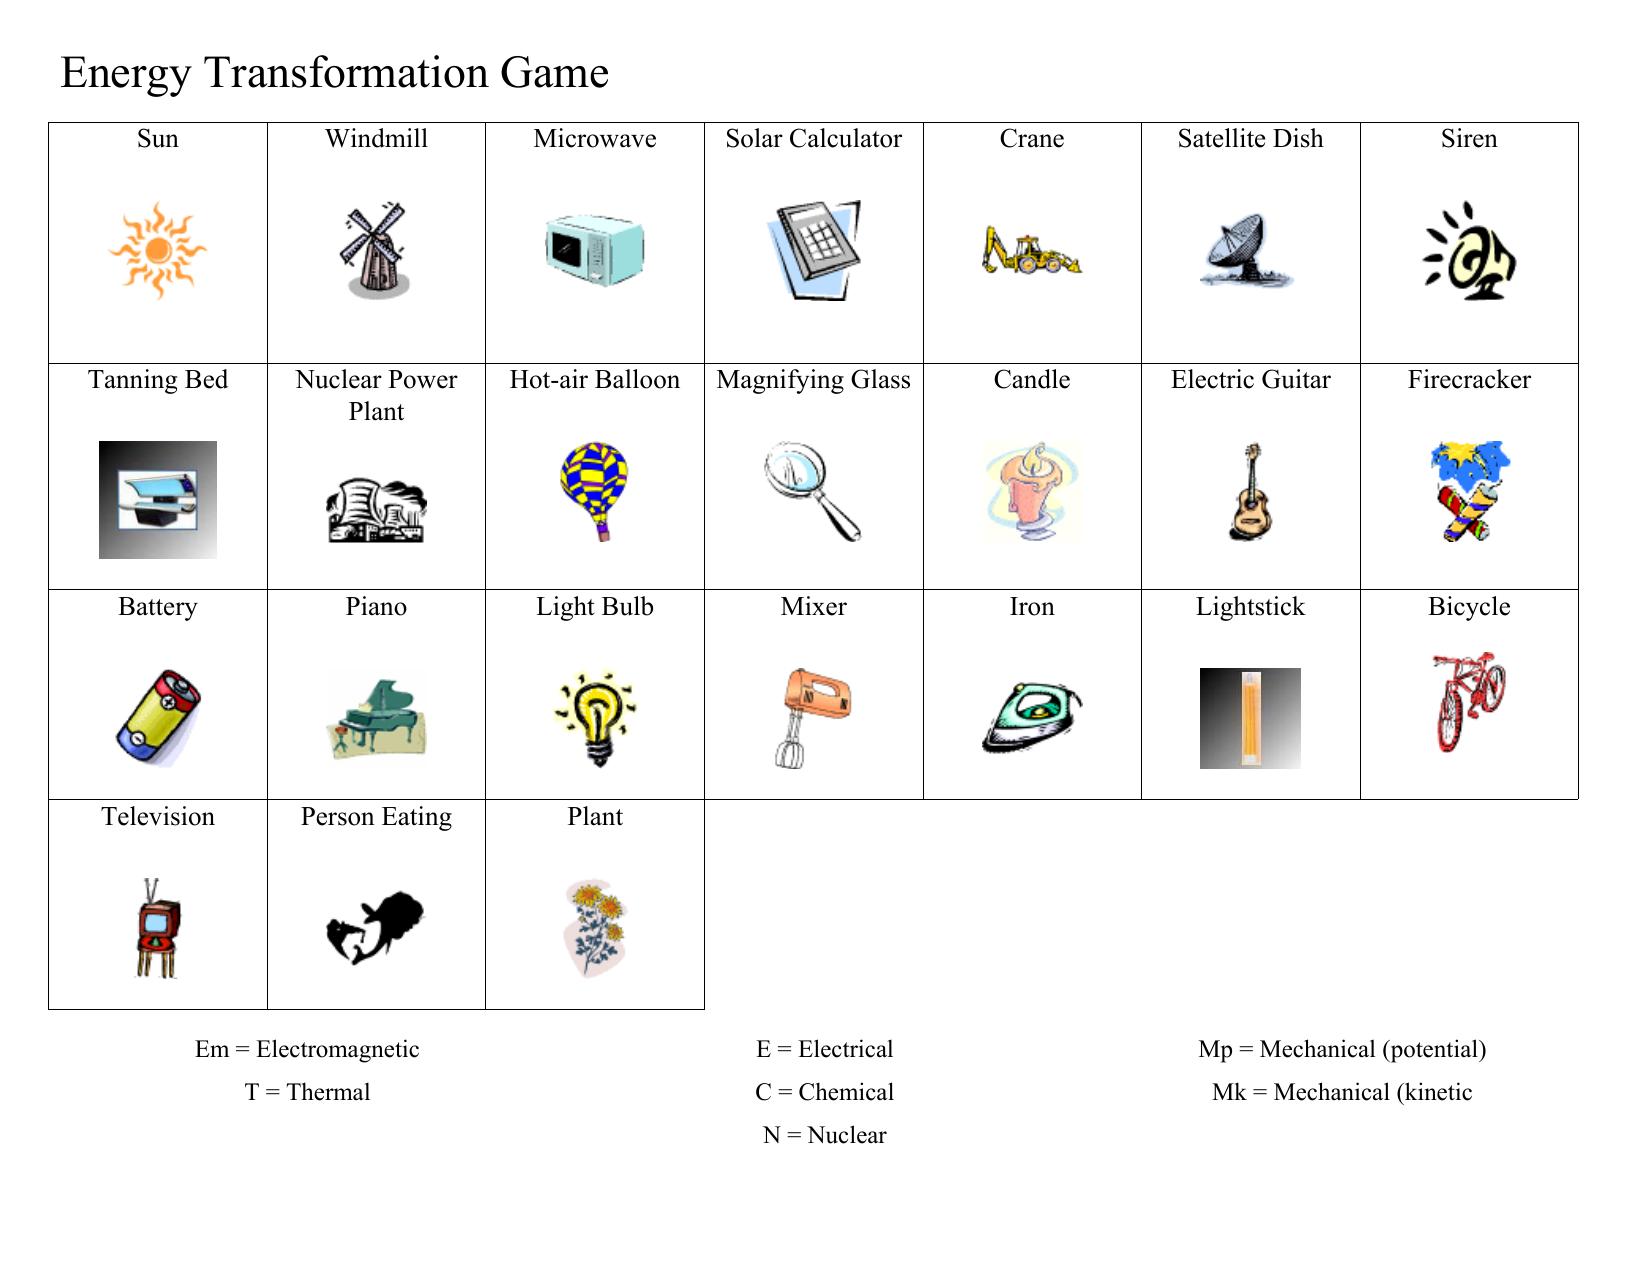 Energy Transformation Game Worksheet Answer Key - Livinghealthybulletin